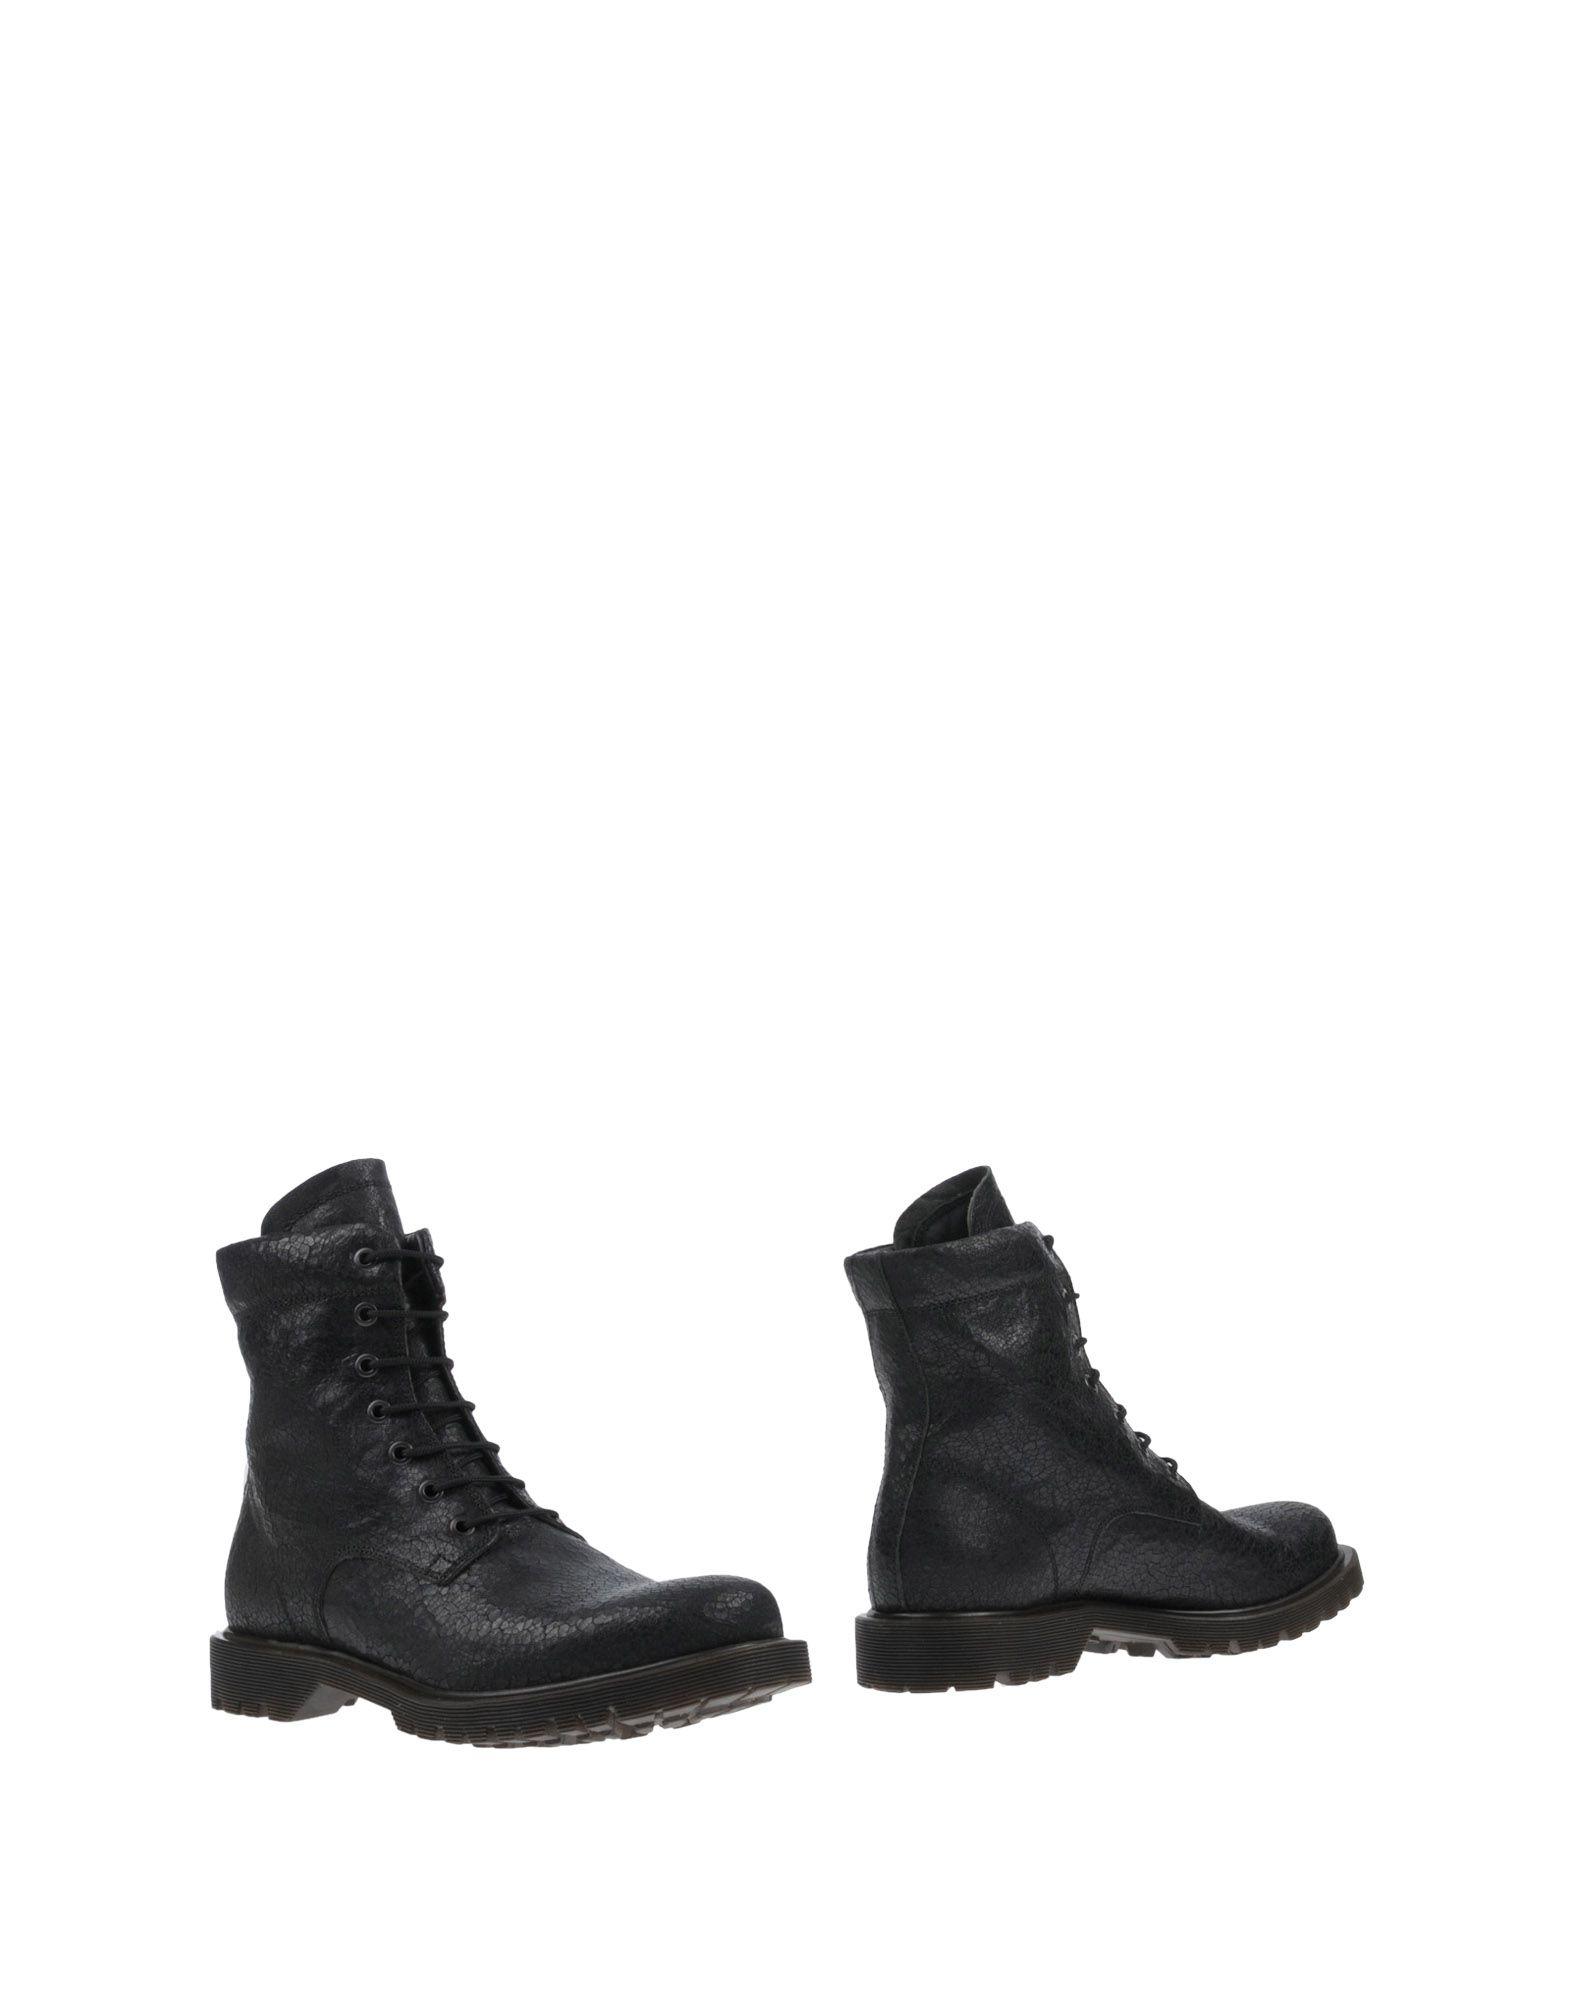 Bottine Pantofola Doro Homme - Bottines Pantofola Doro sur